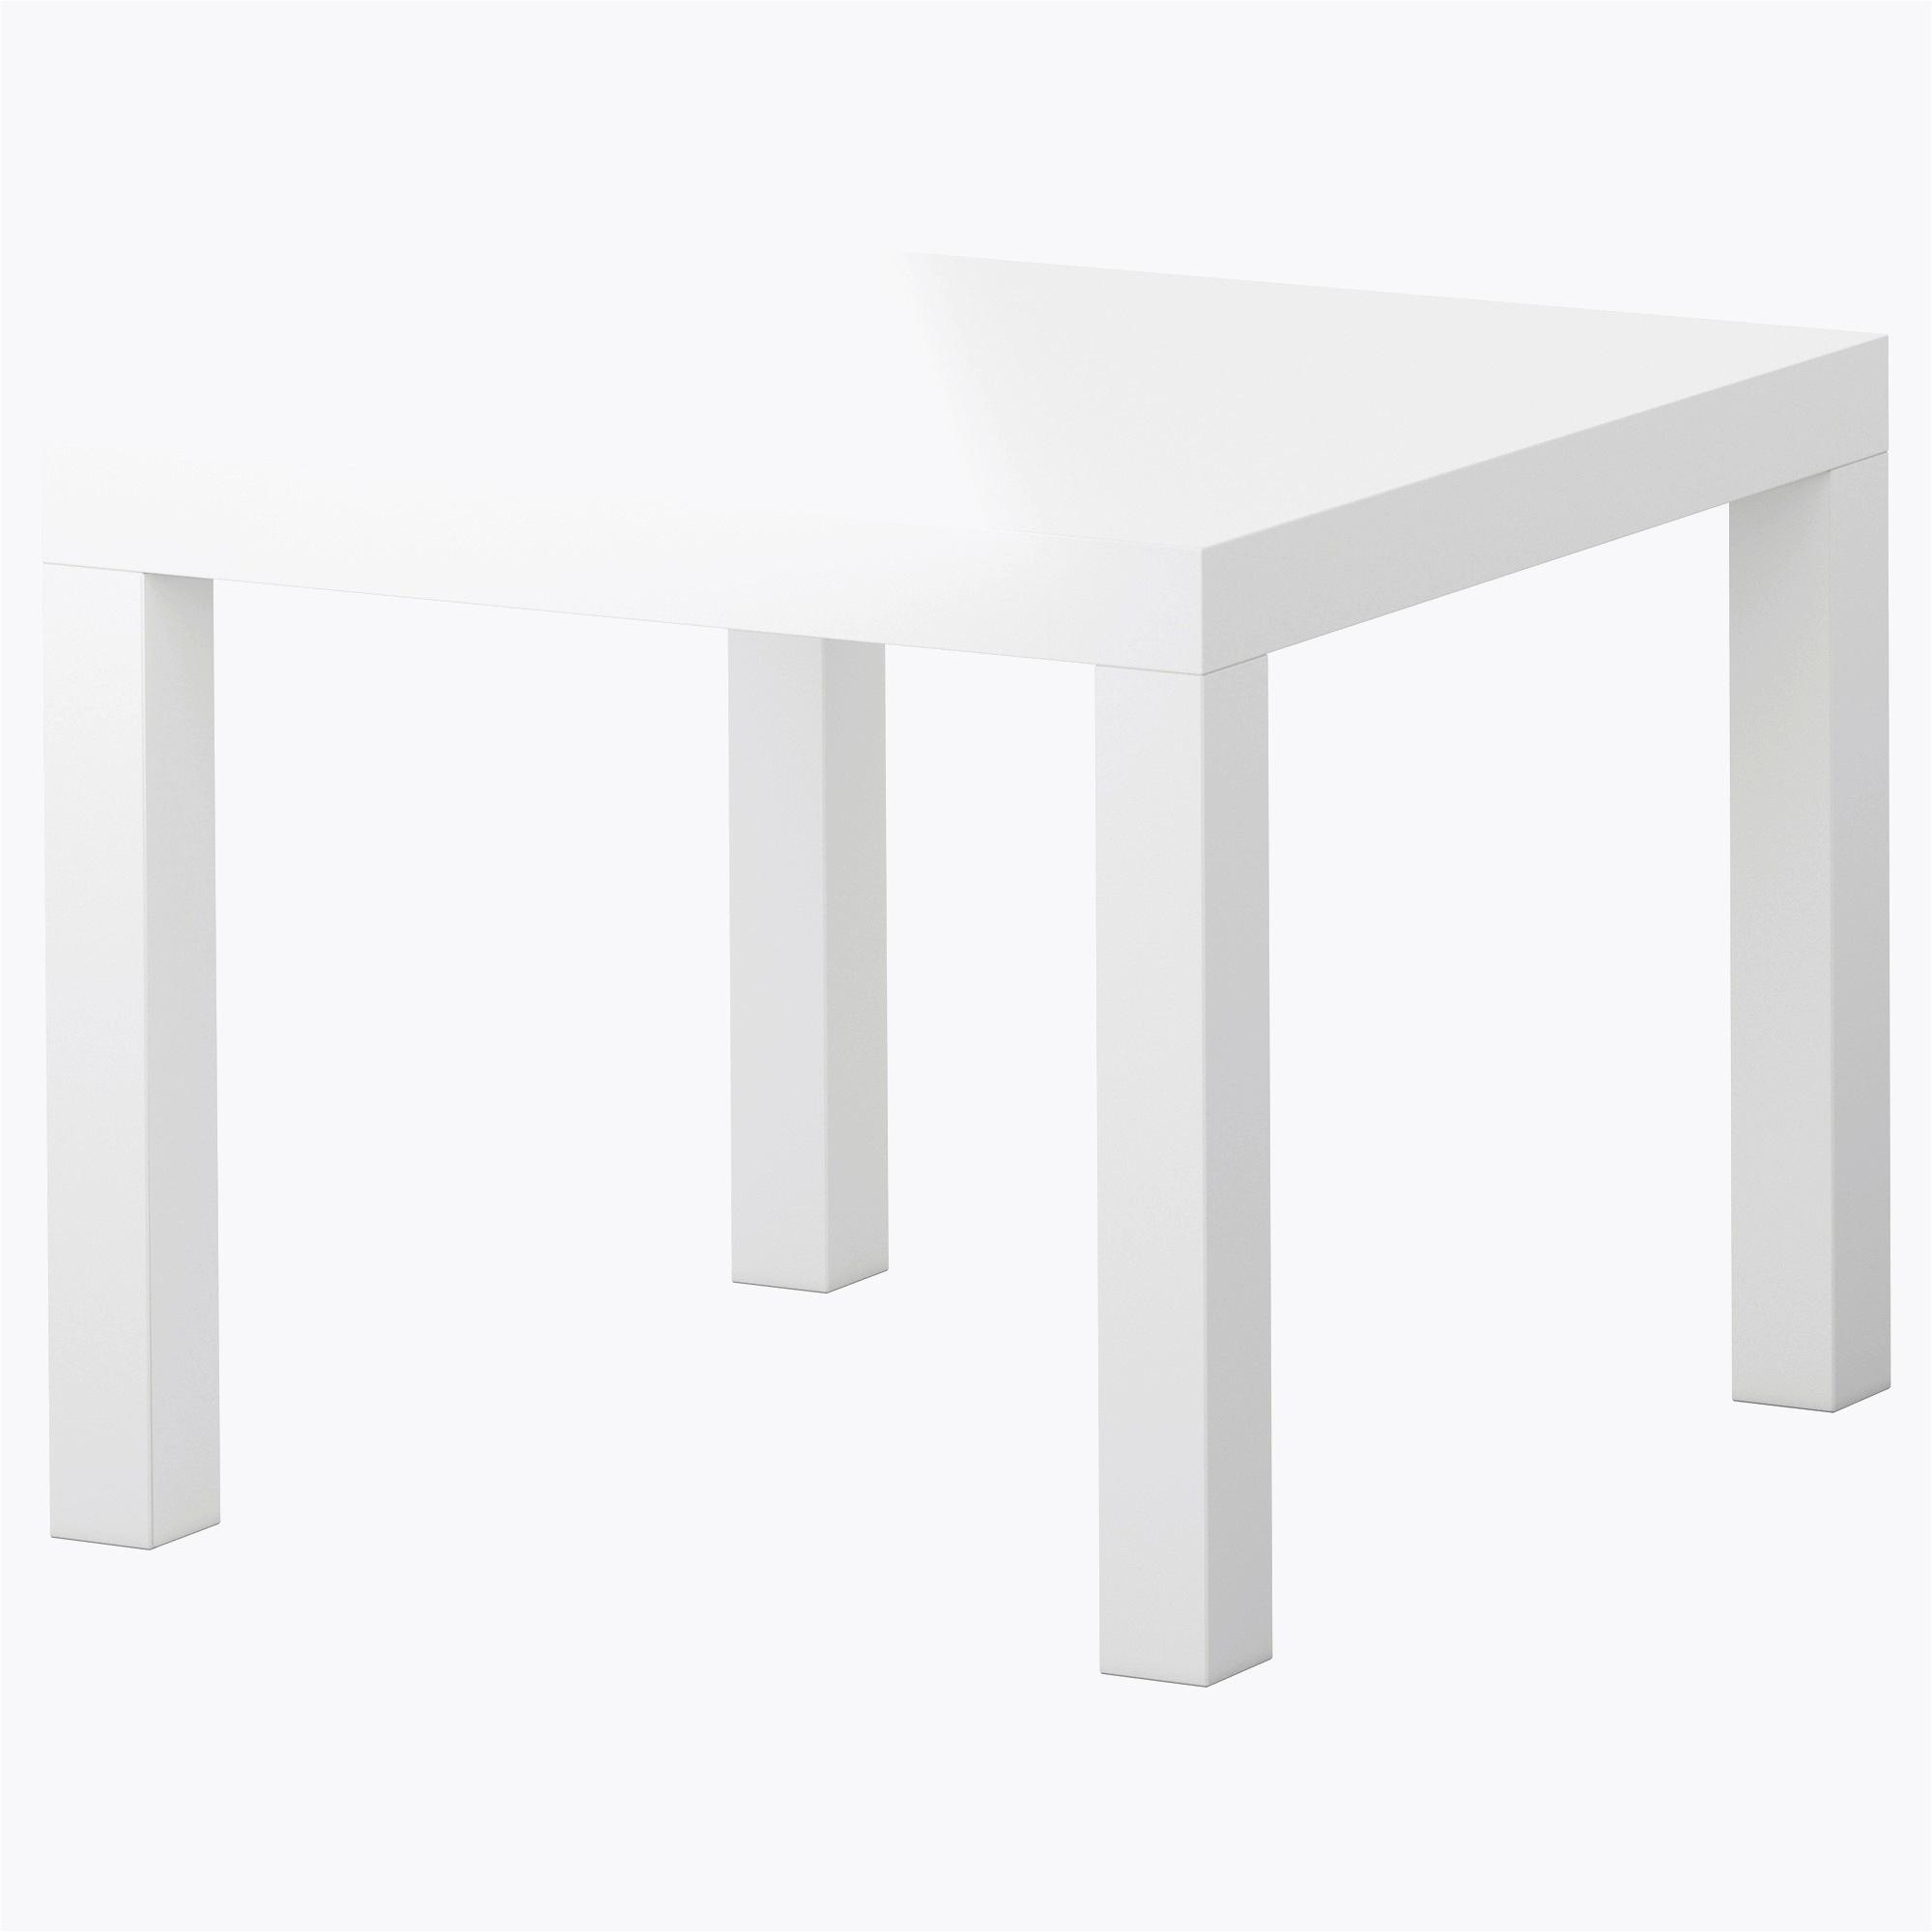 table basse relevable extensible ikea elegant tables de jardin table jardin extensible luxury alinea chaise 0d of table basse relevable extensible ikea